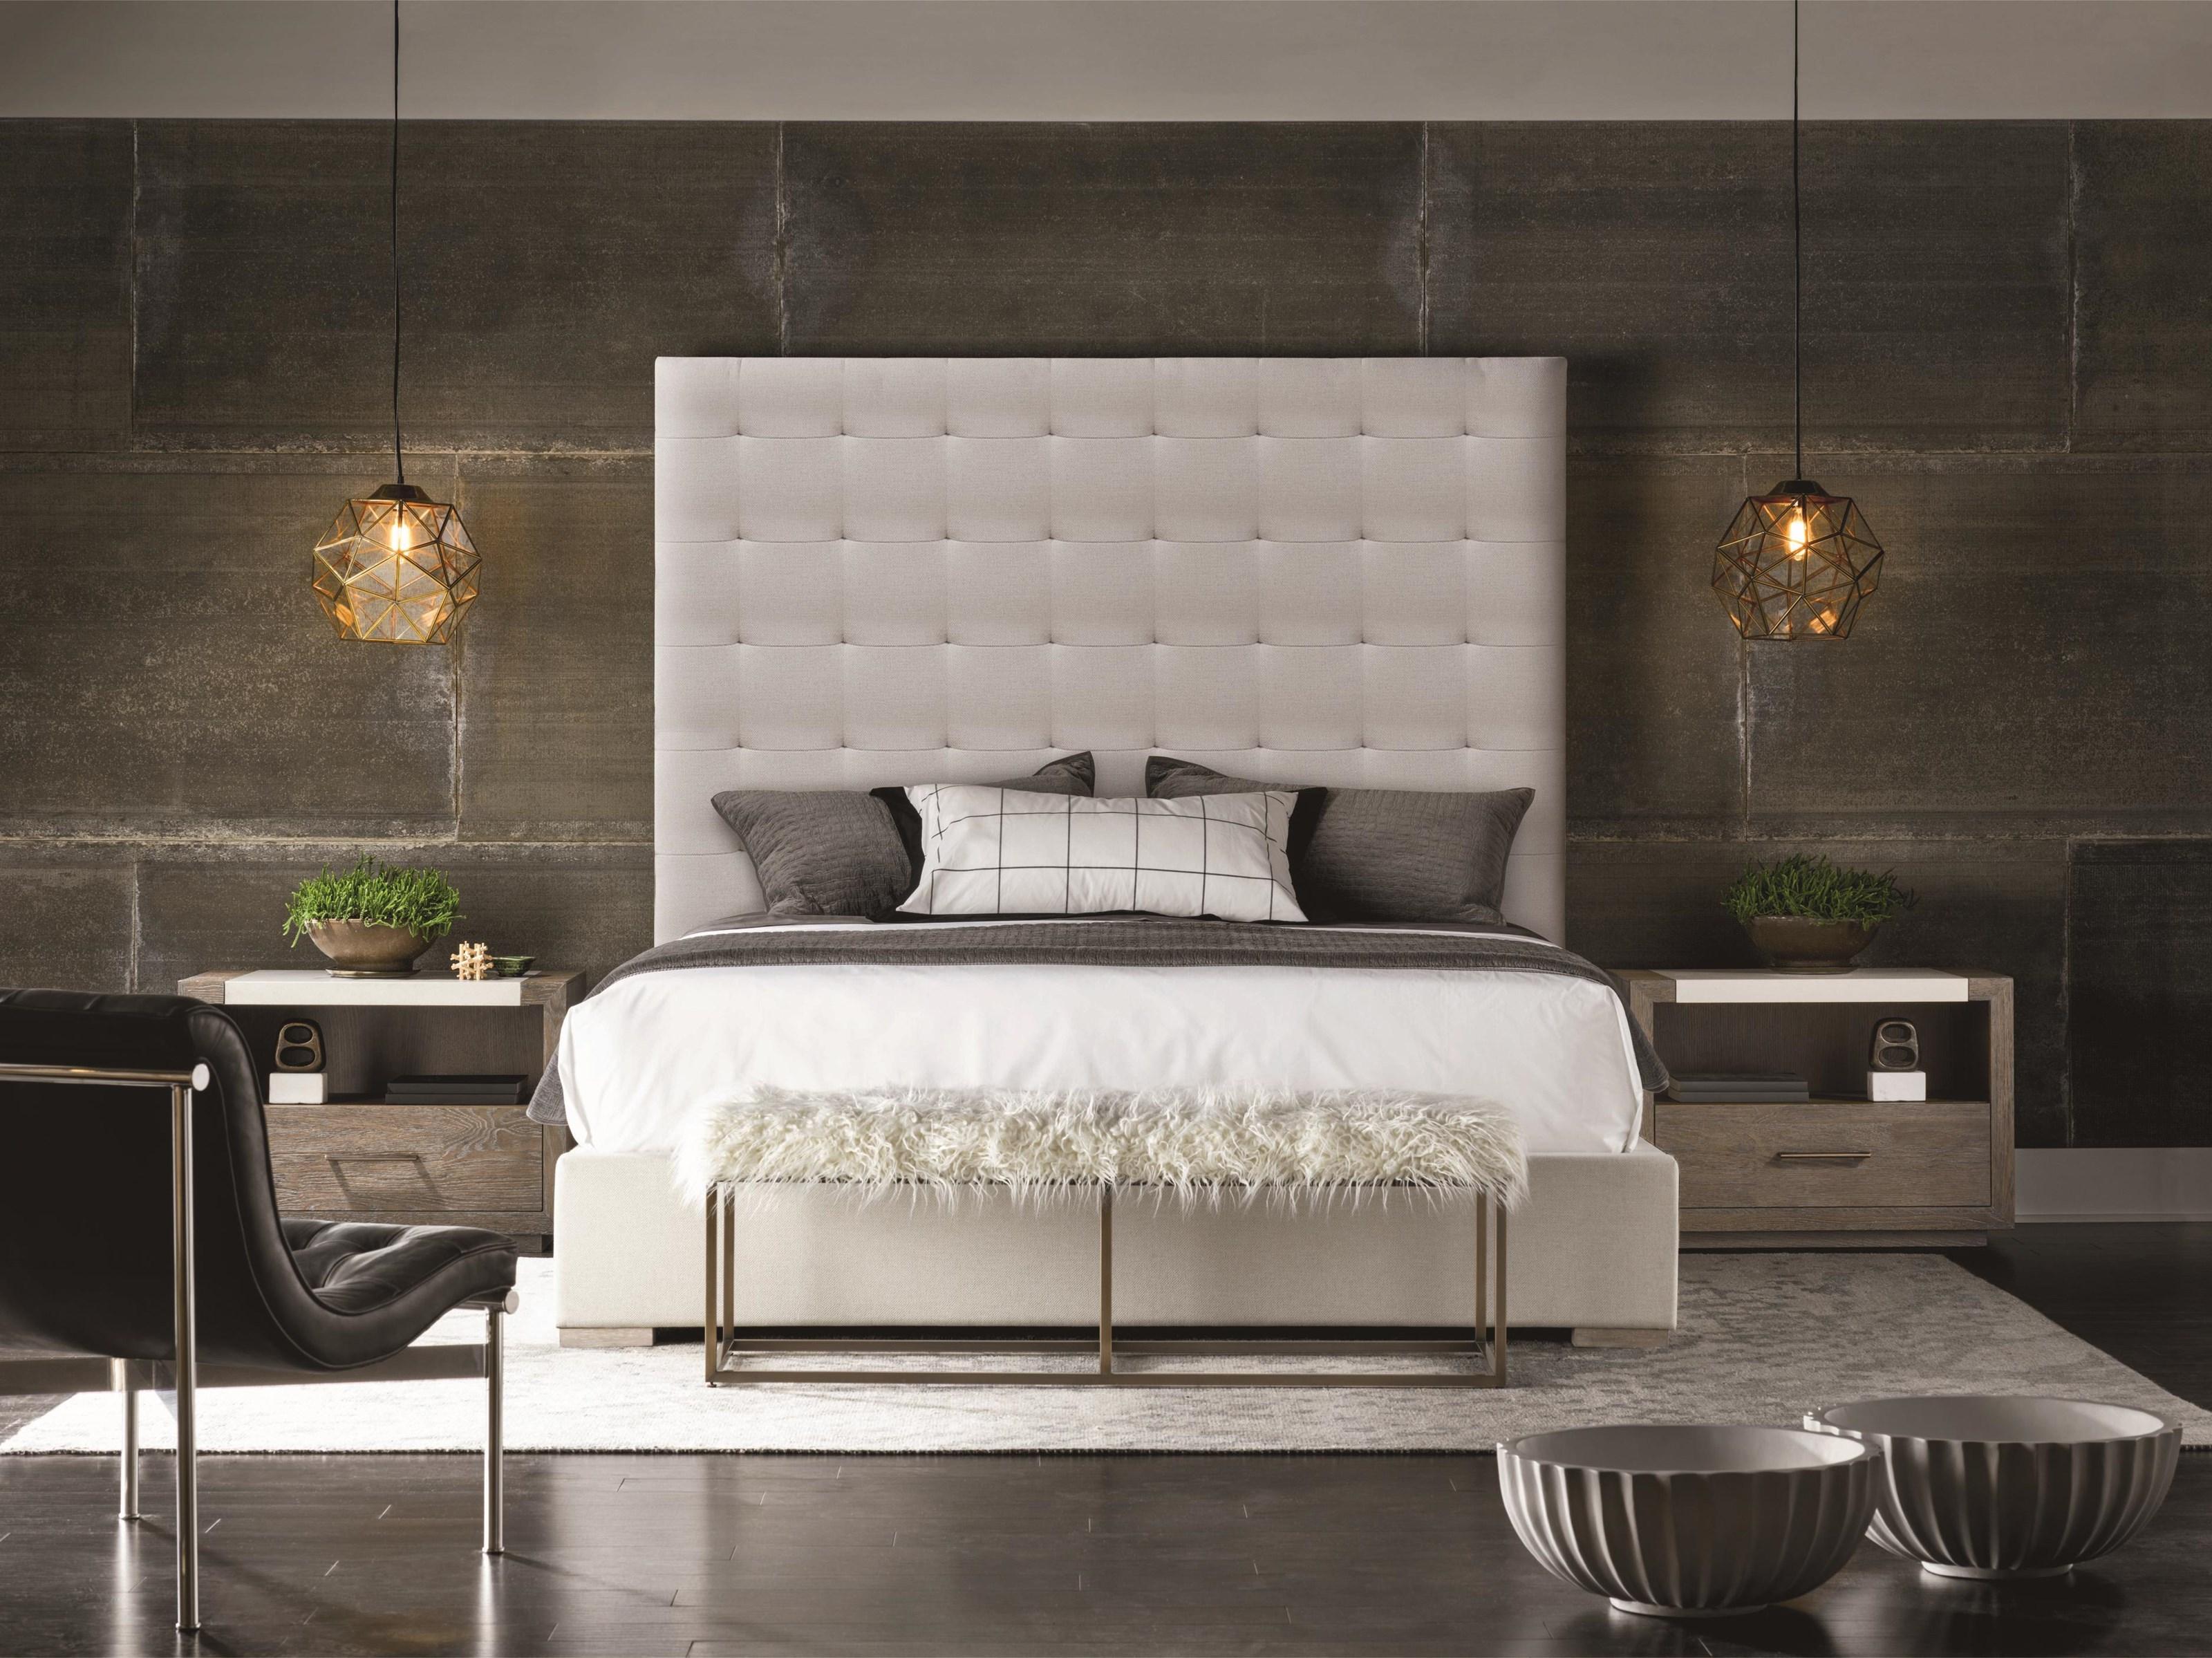 Universal Modern 643220B Brando Bed With Tufted Headboard